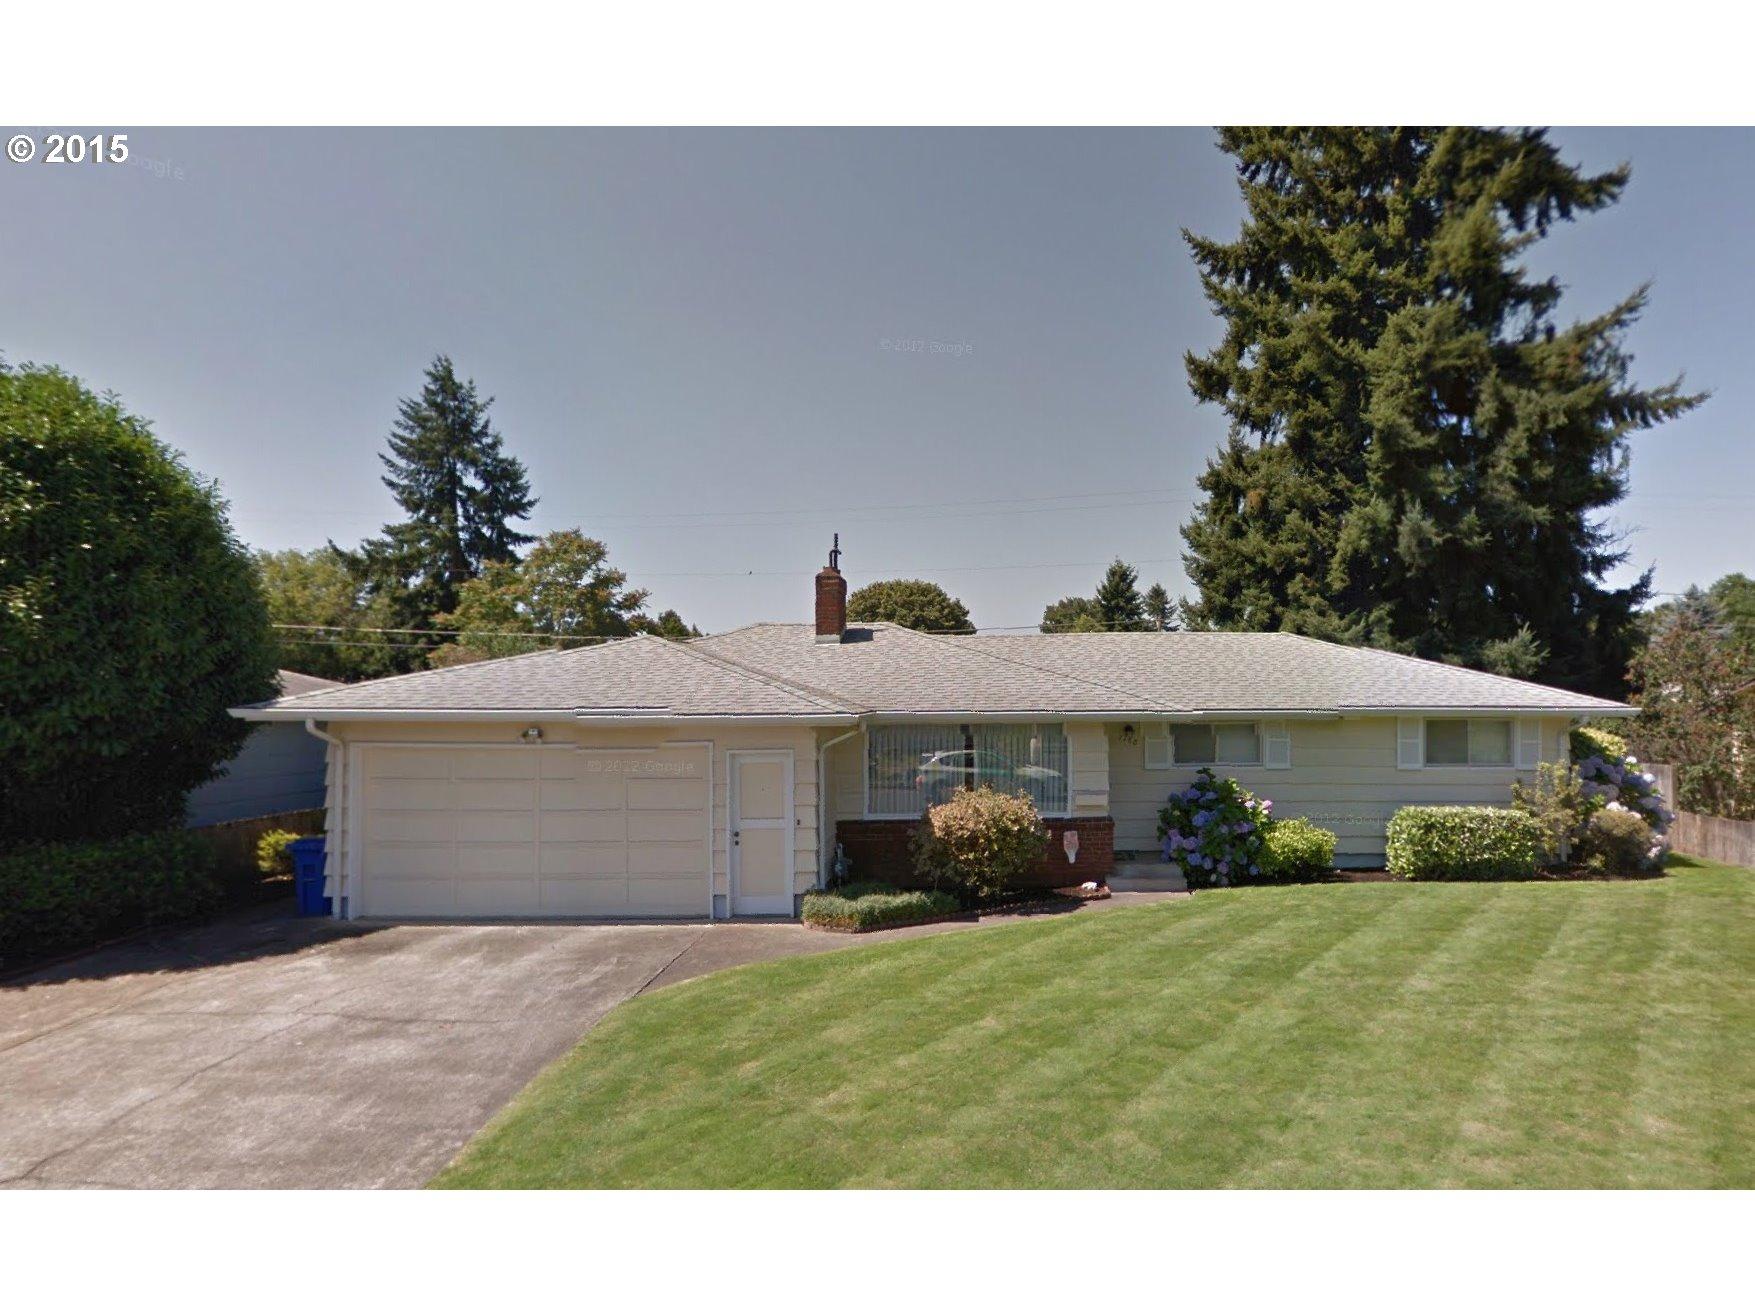 1788 LINWOOD ST, Eugene OR 97404